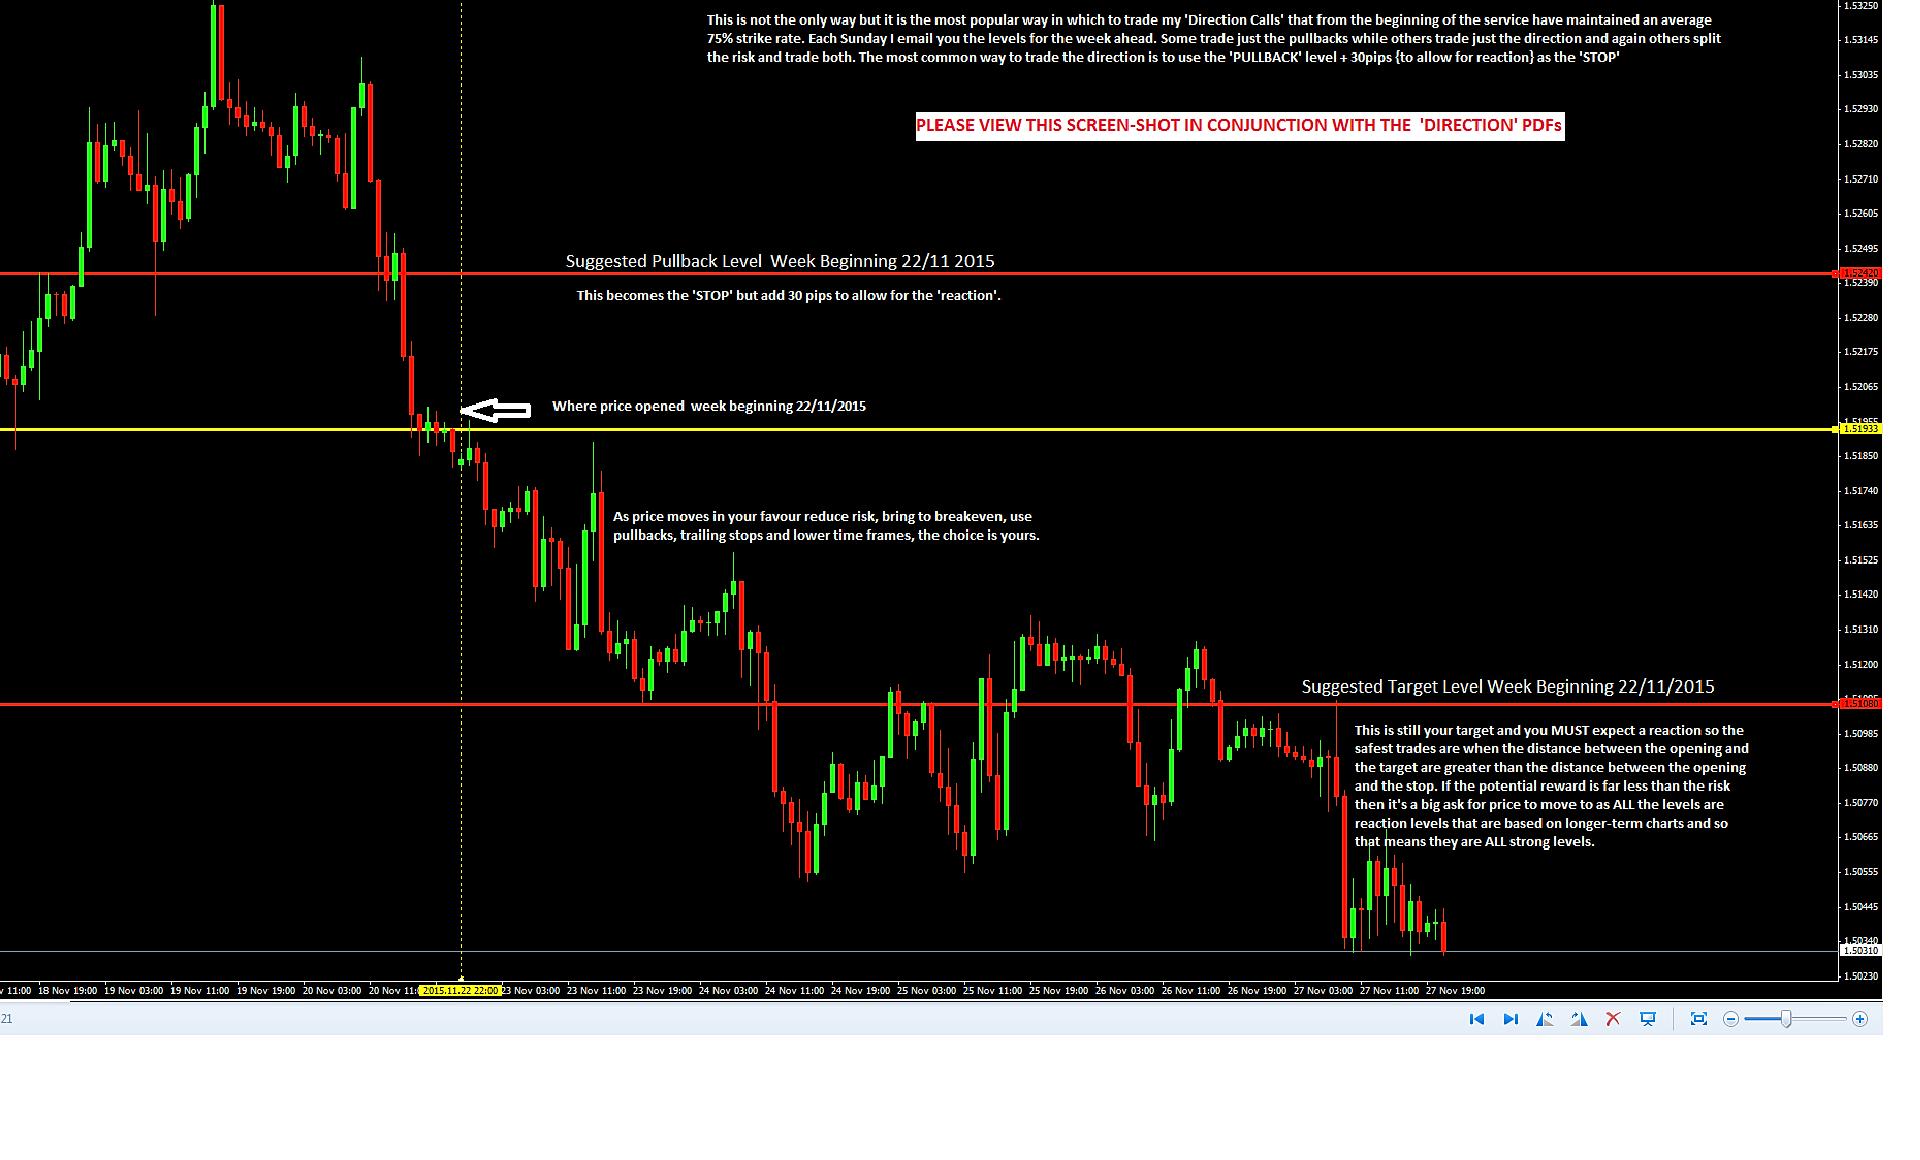 Market open trading strategies